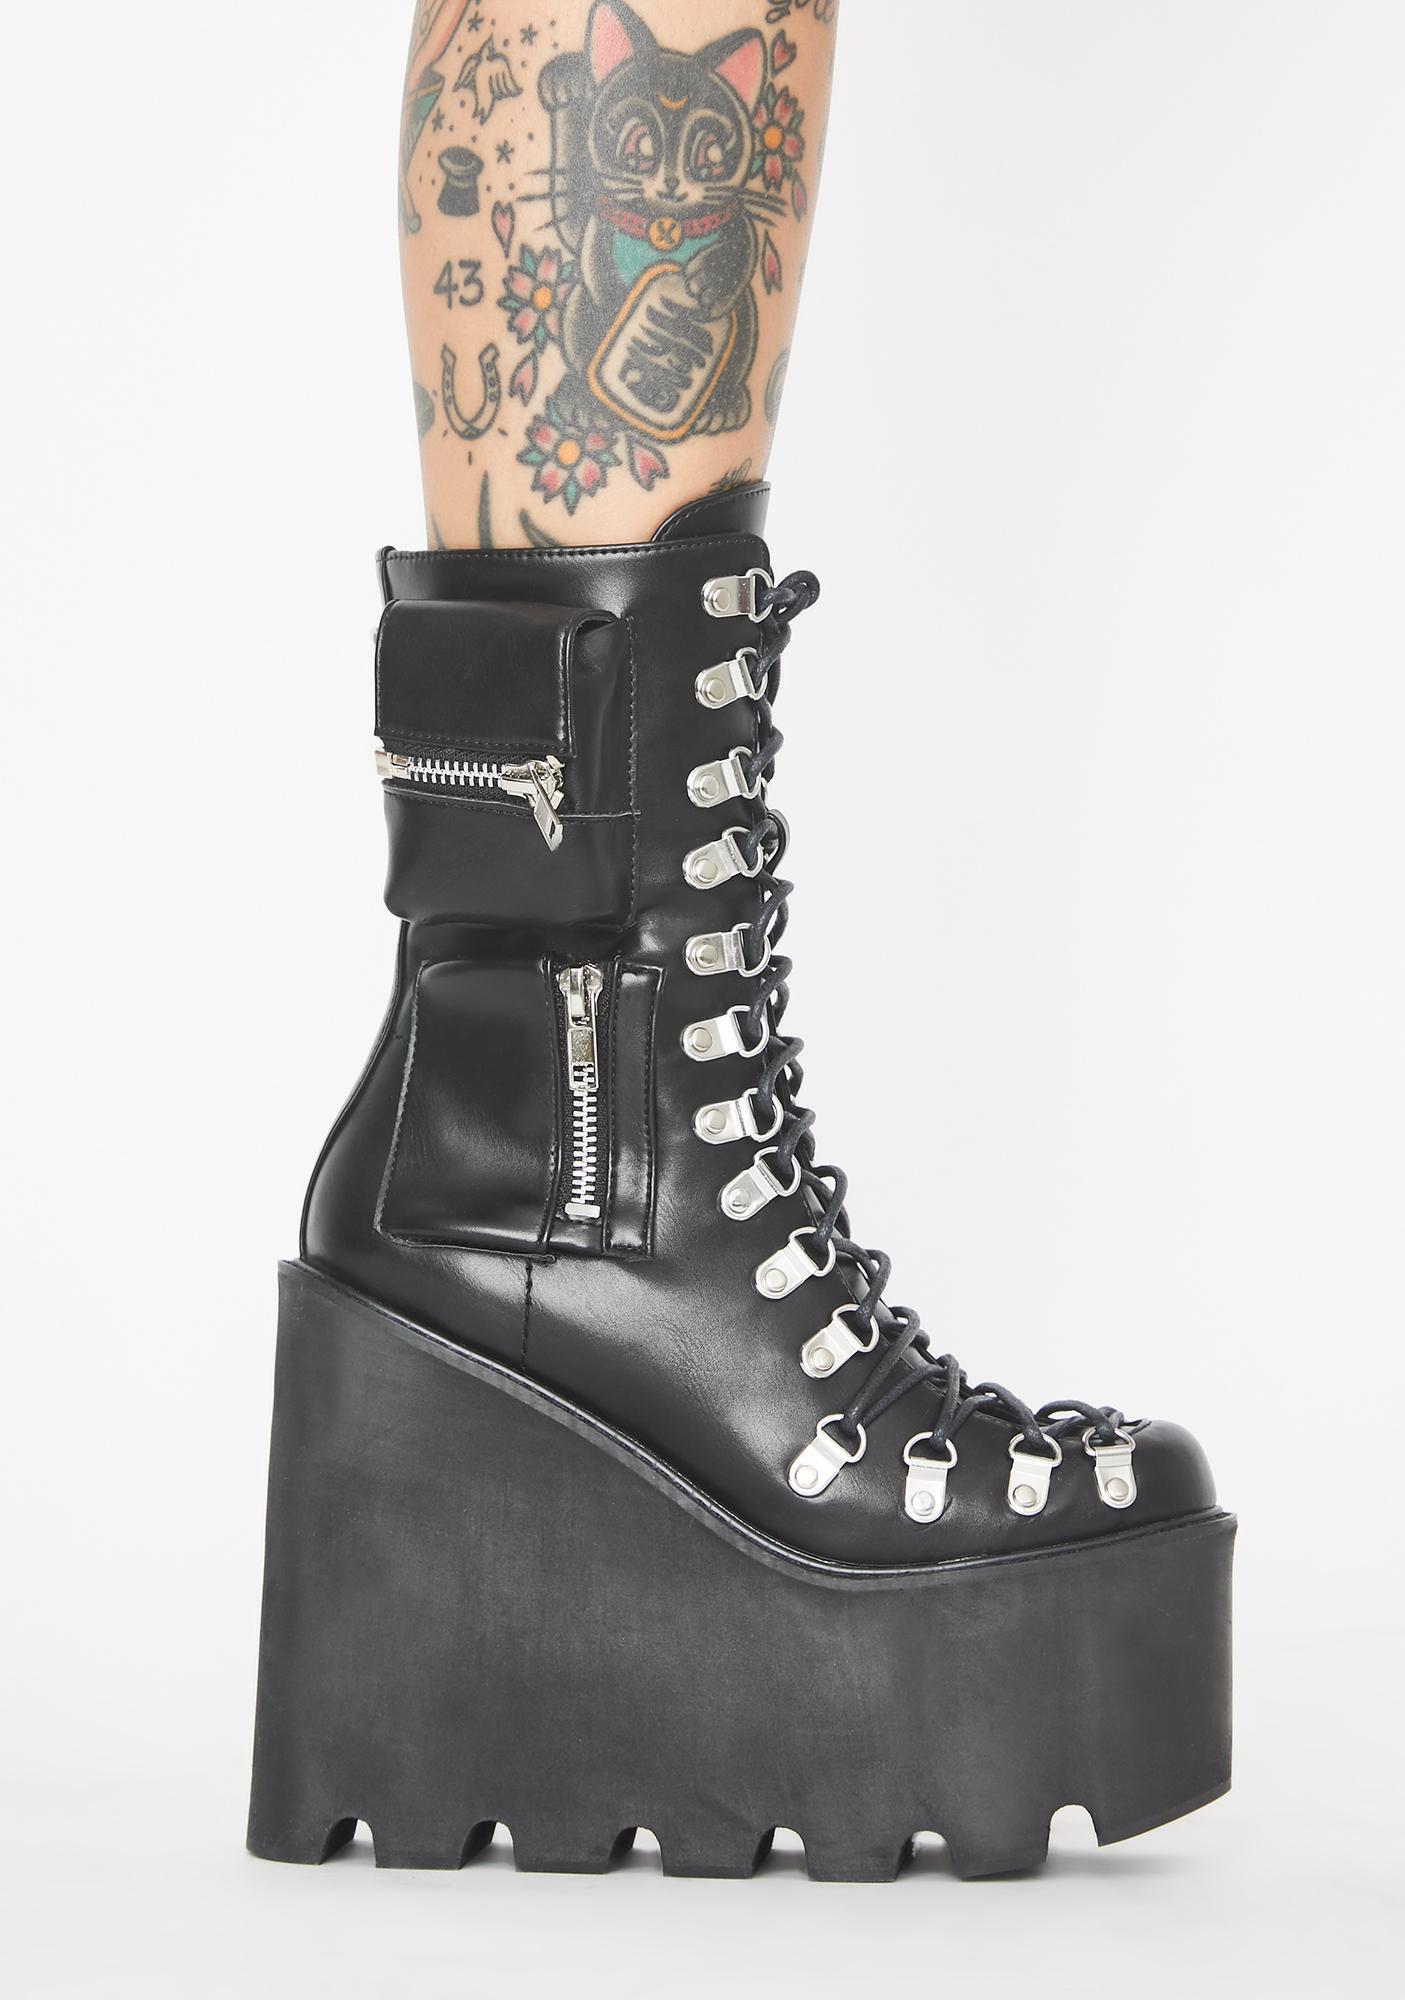 Current Mood Obsidian Pocket Traitor Boots